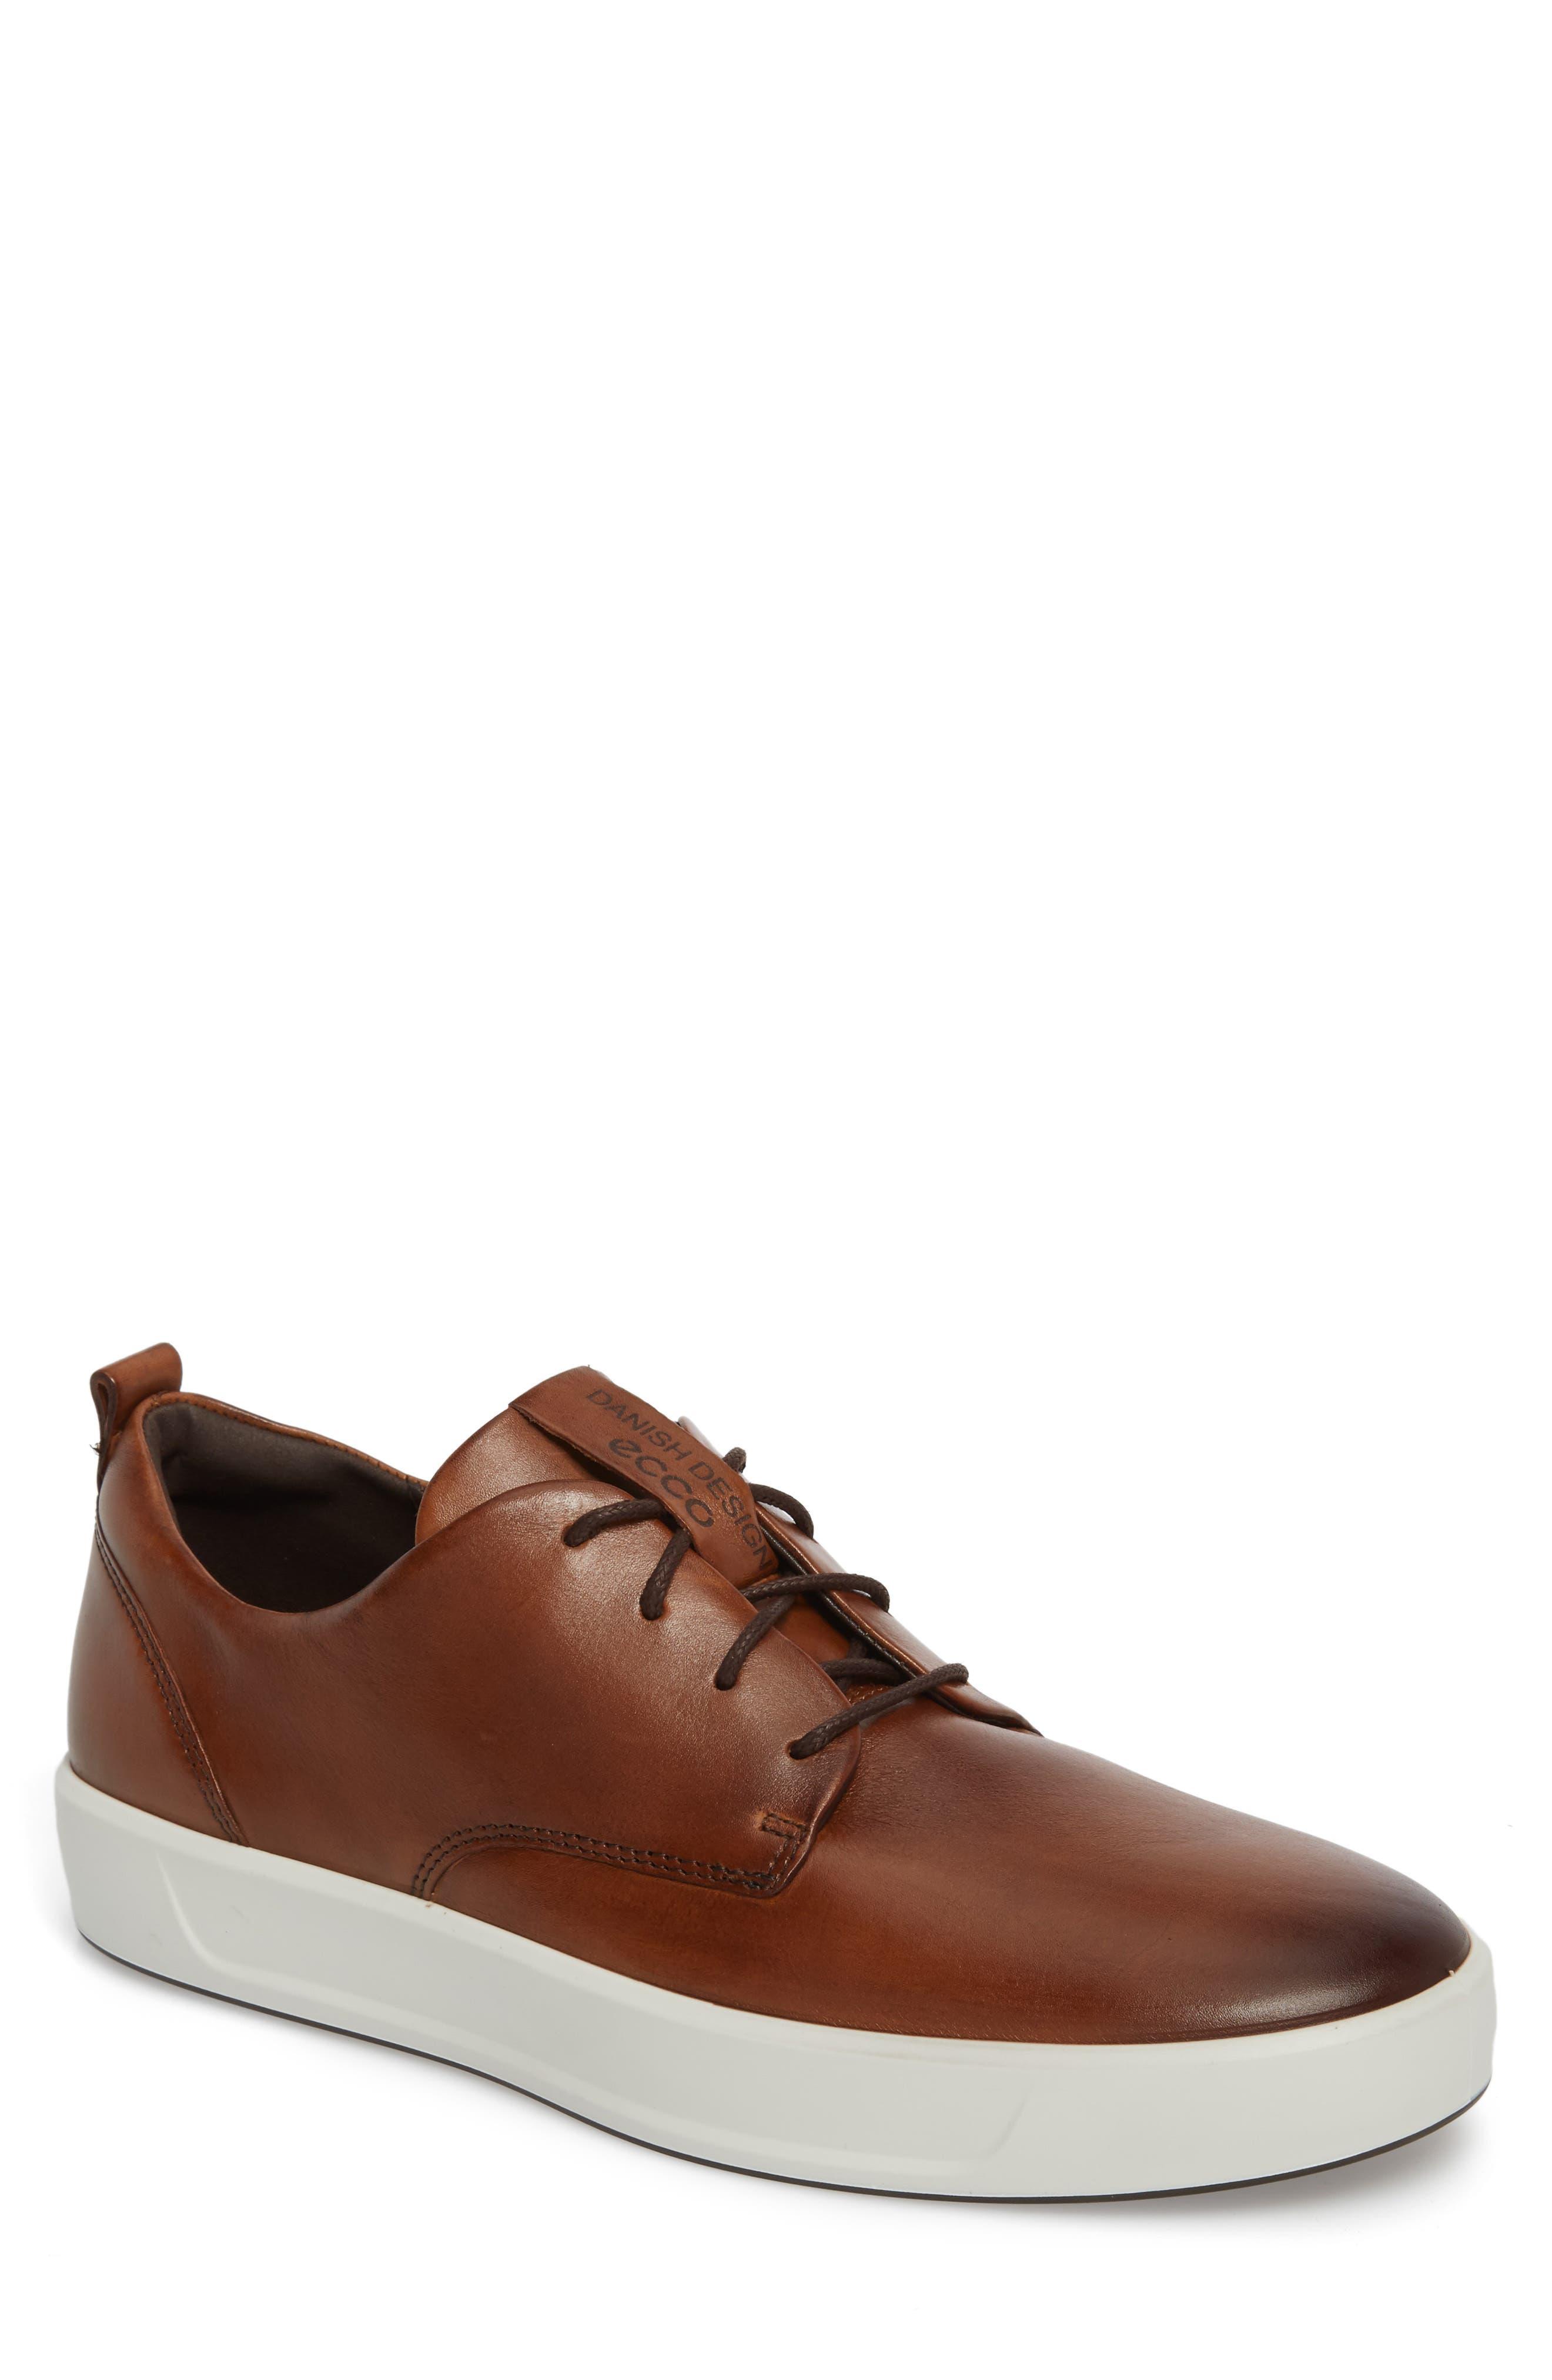 Soft 8 Street Sneaker,                             Main thumbnail 1, color,                             Lion Leather